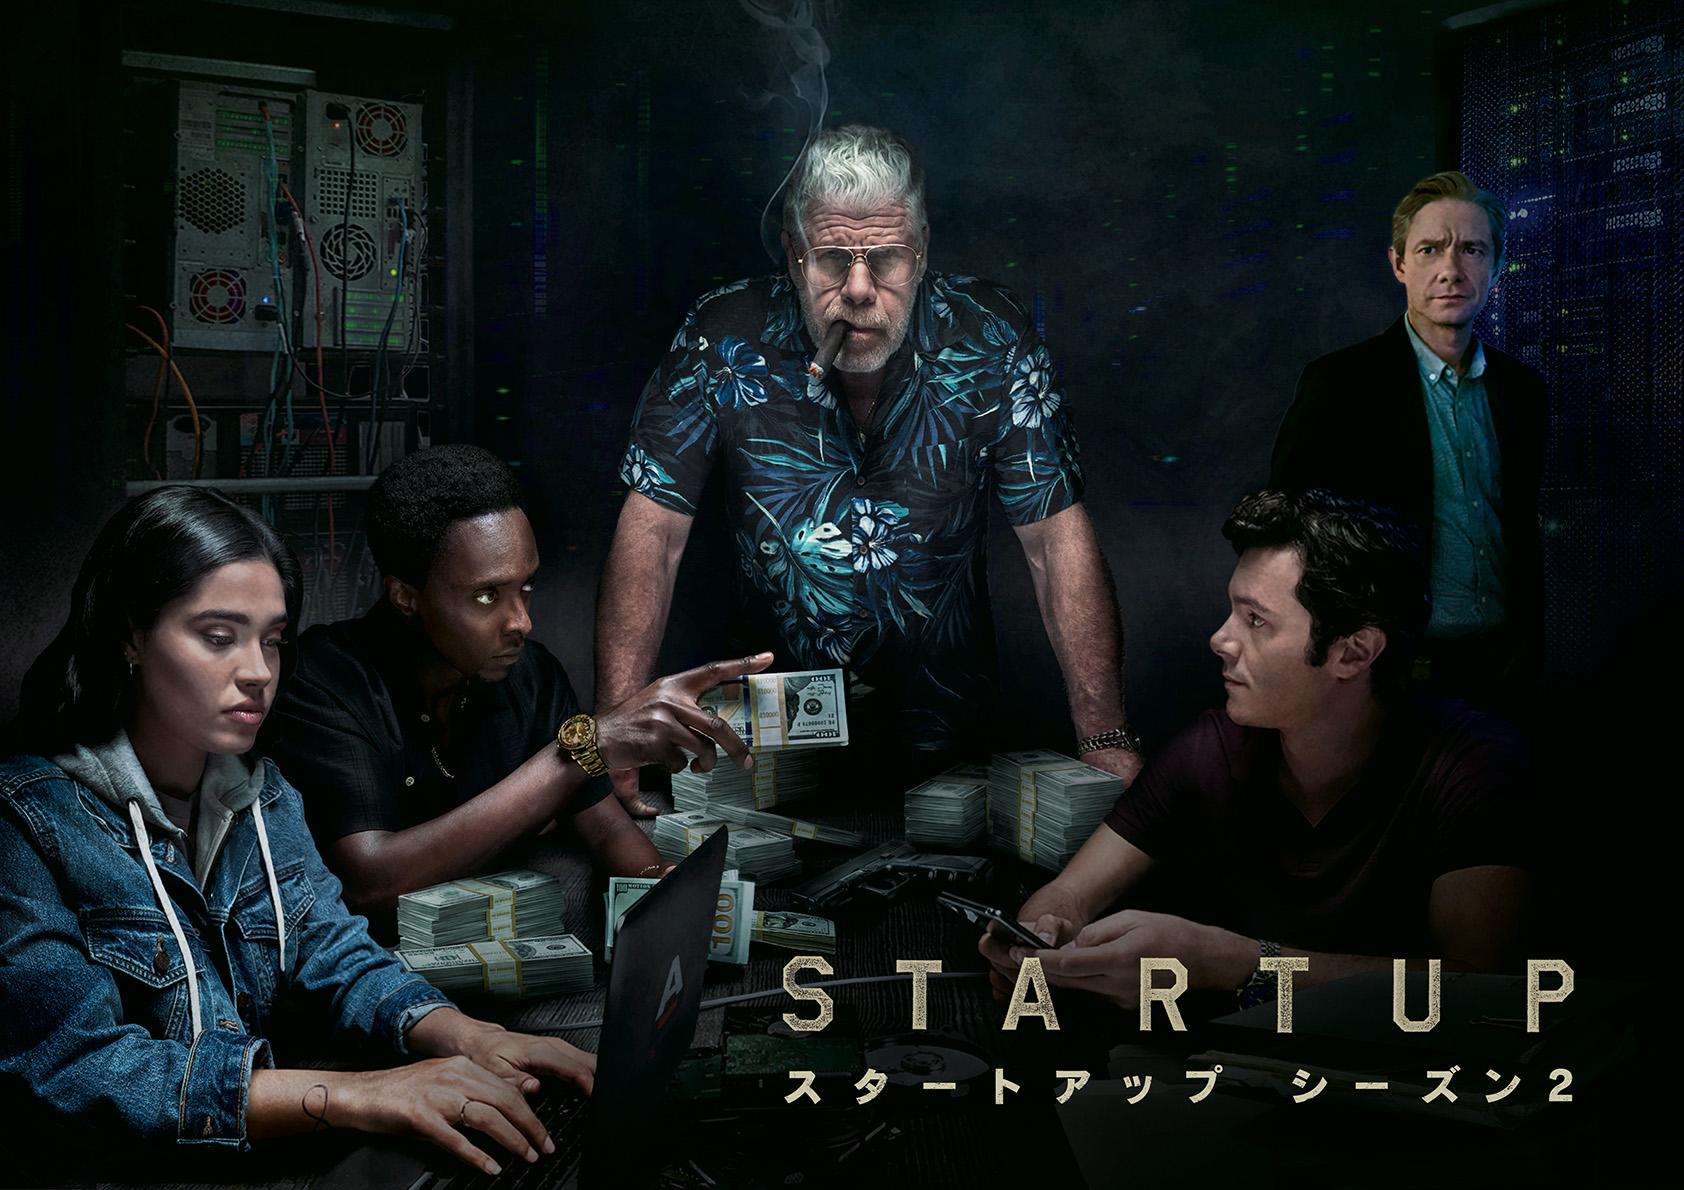 STARTUP スタートアップ シーズン2